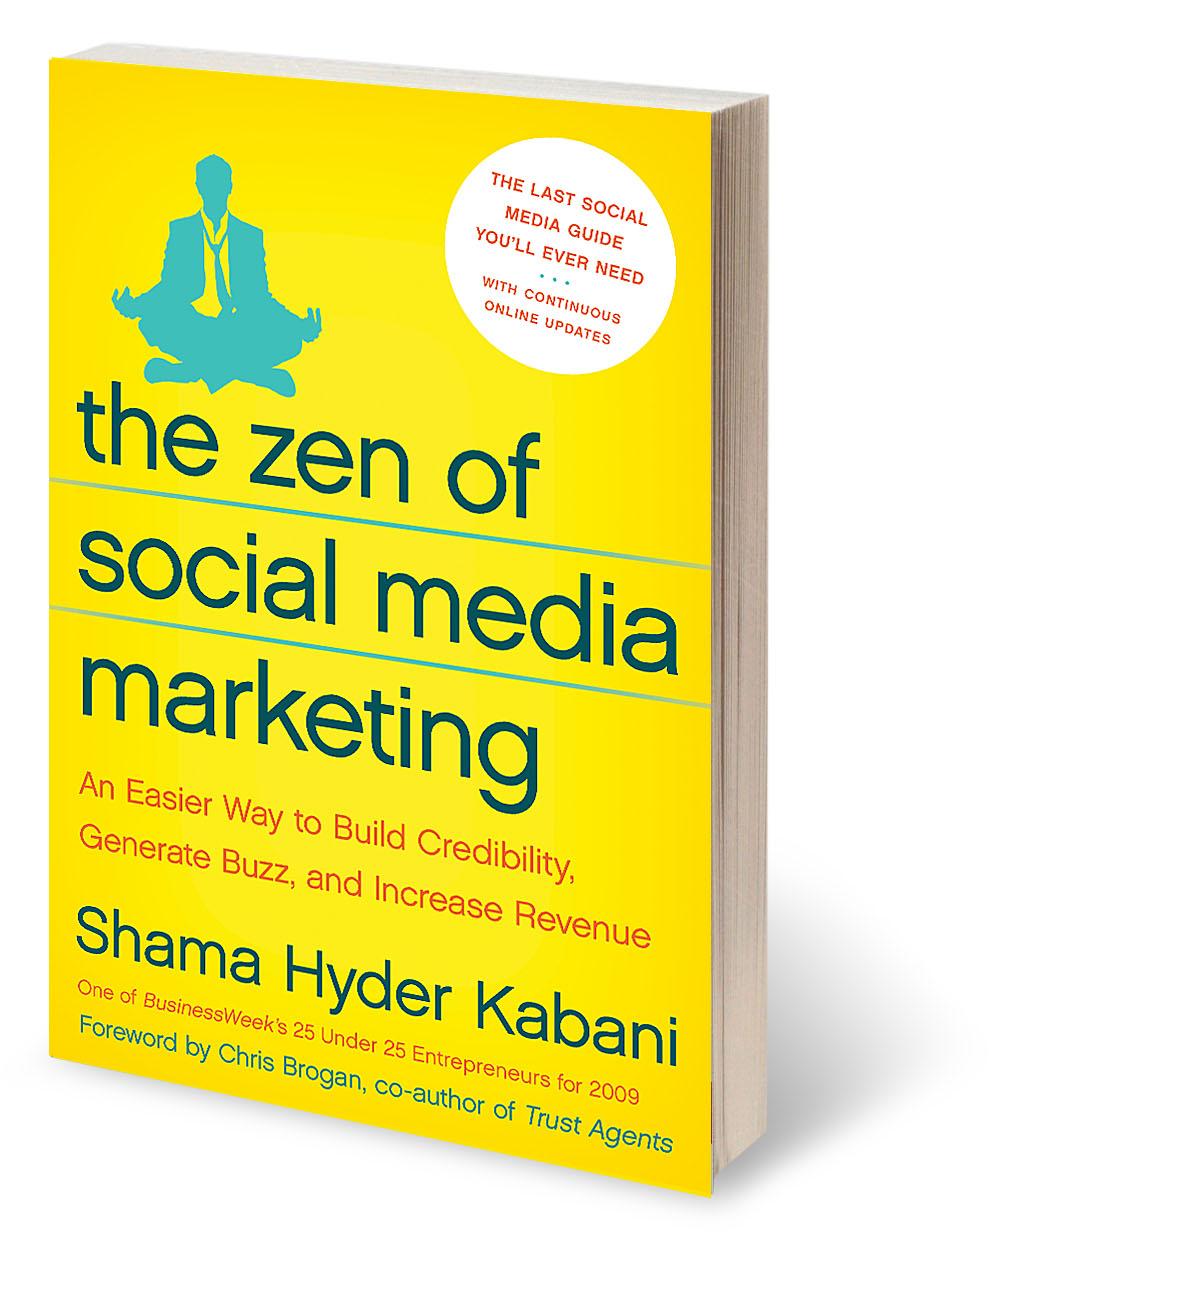 The Zen of Social Media Marketing Book Review